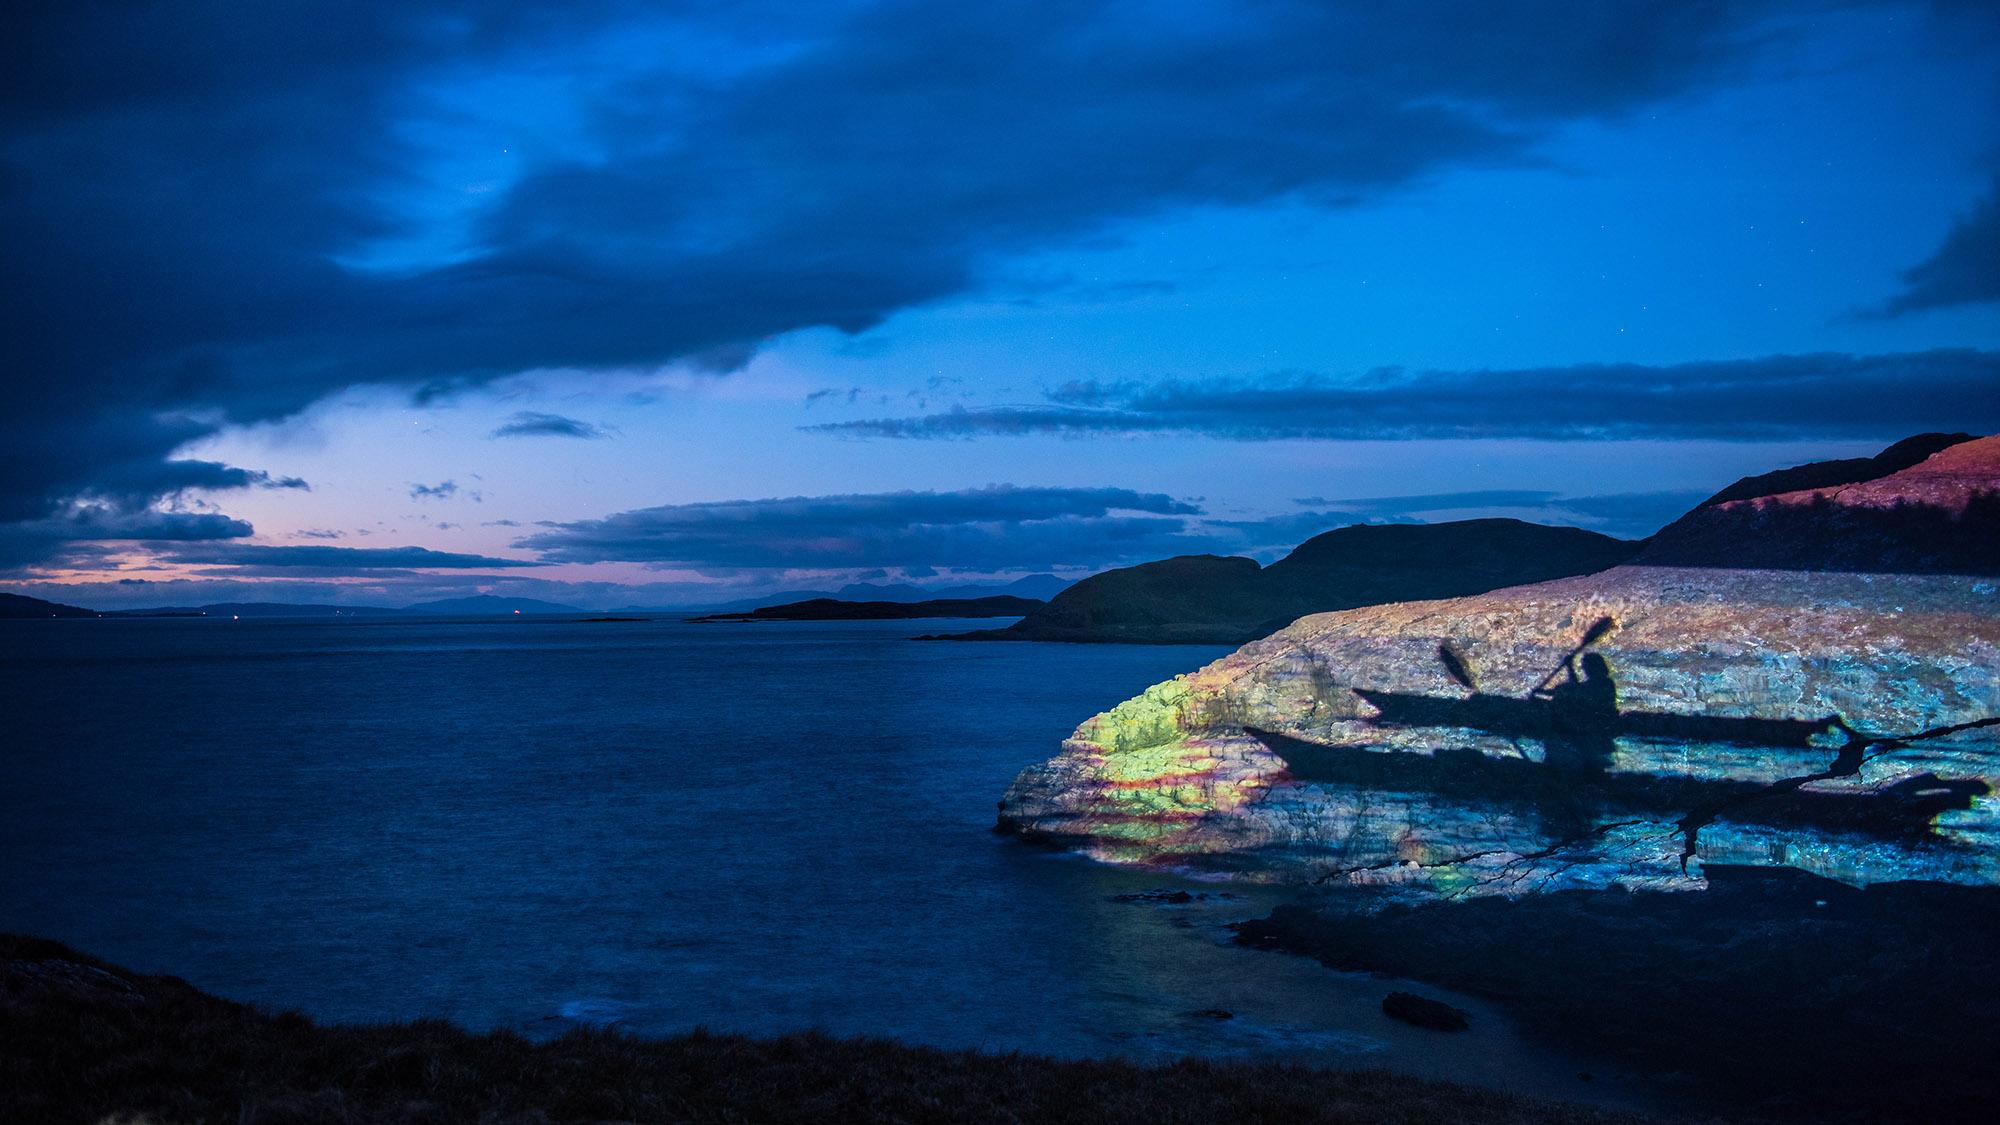 Calmac timelapse marketing film, projection on Scottish Rock